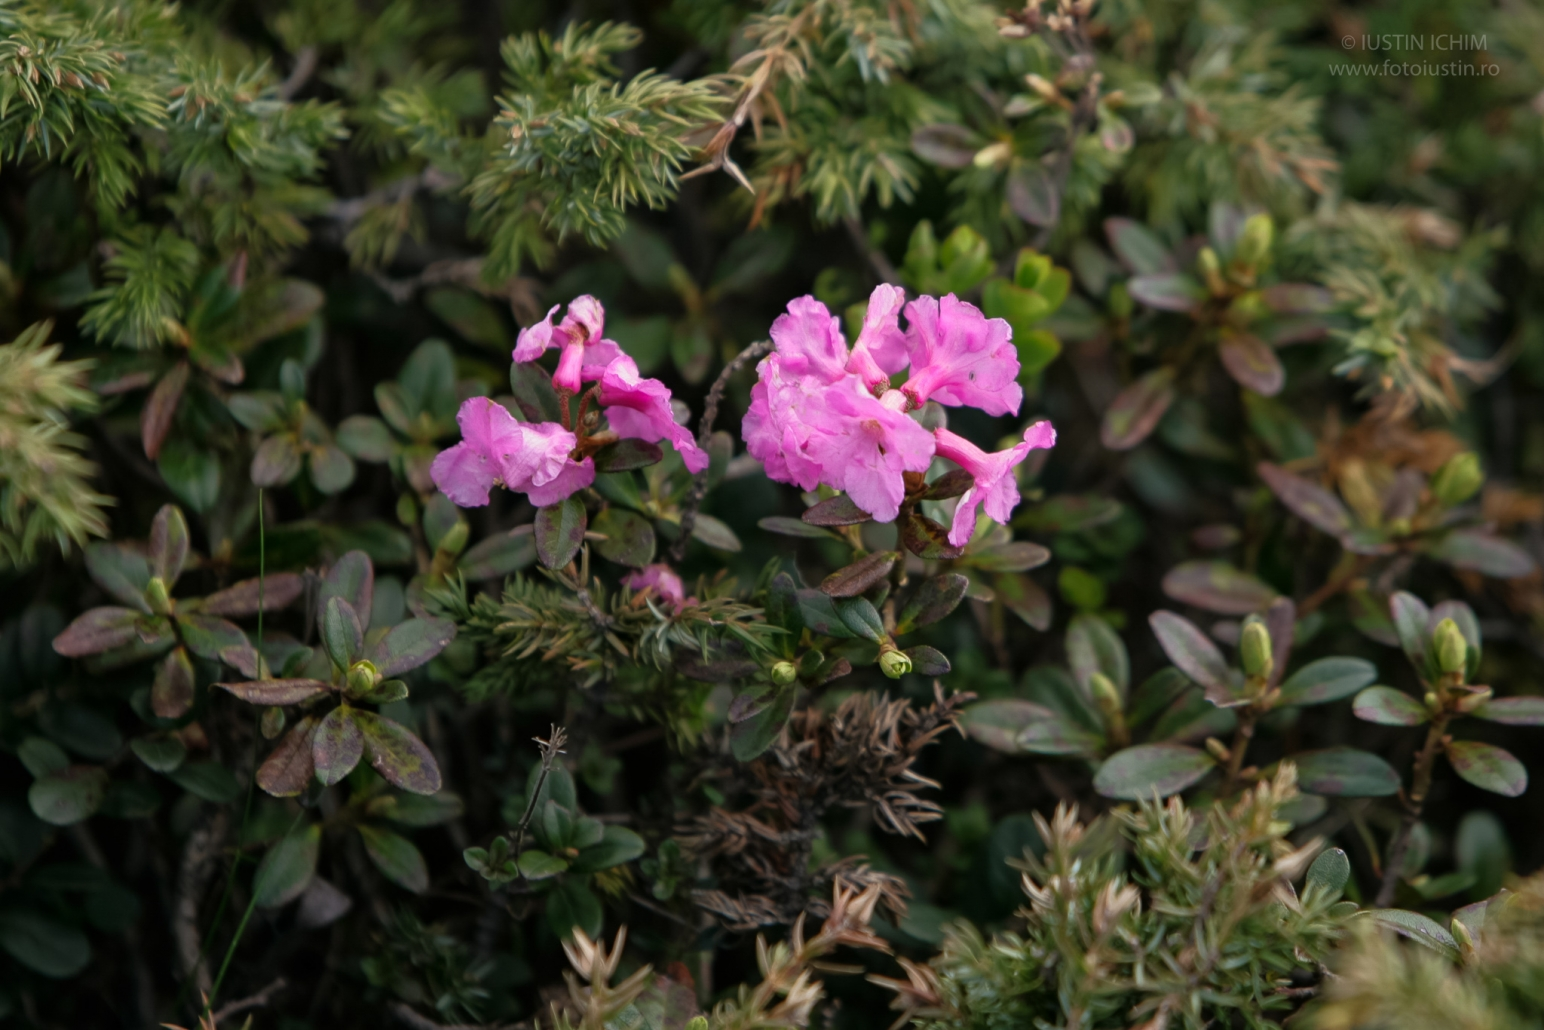 Rhododendron myrtifolium, Smârdar, Bujorul de munte, fam. Ericaceae